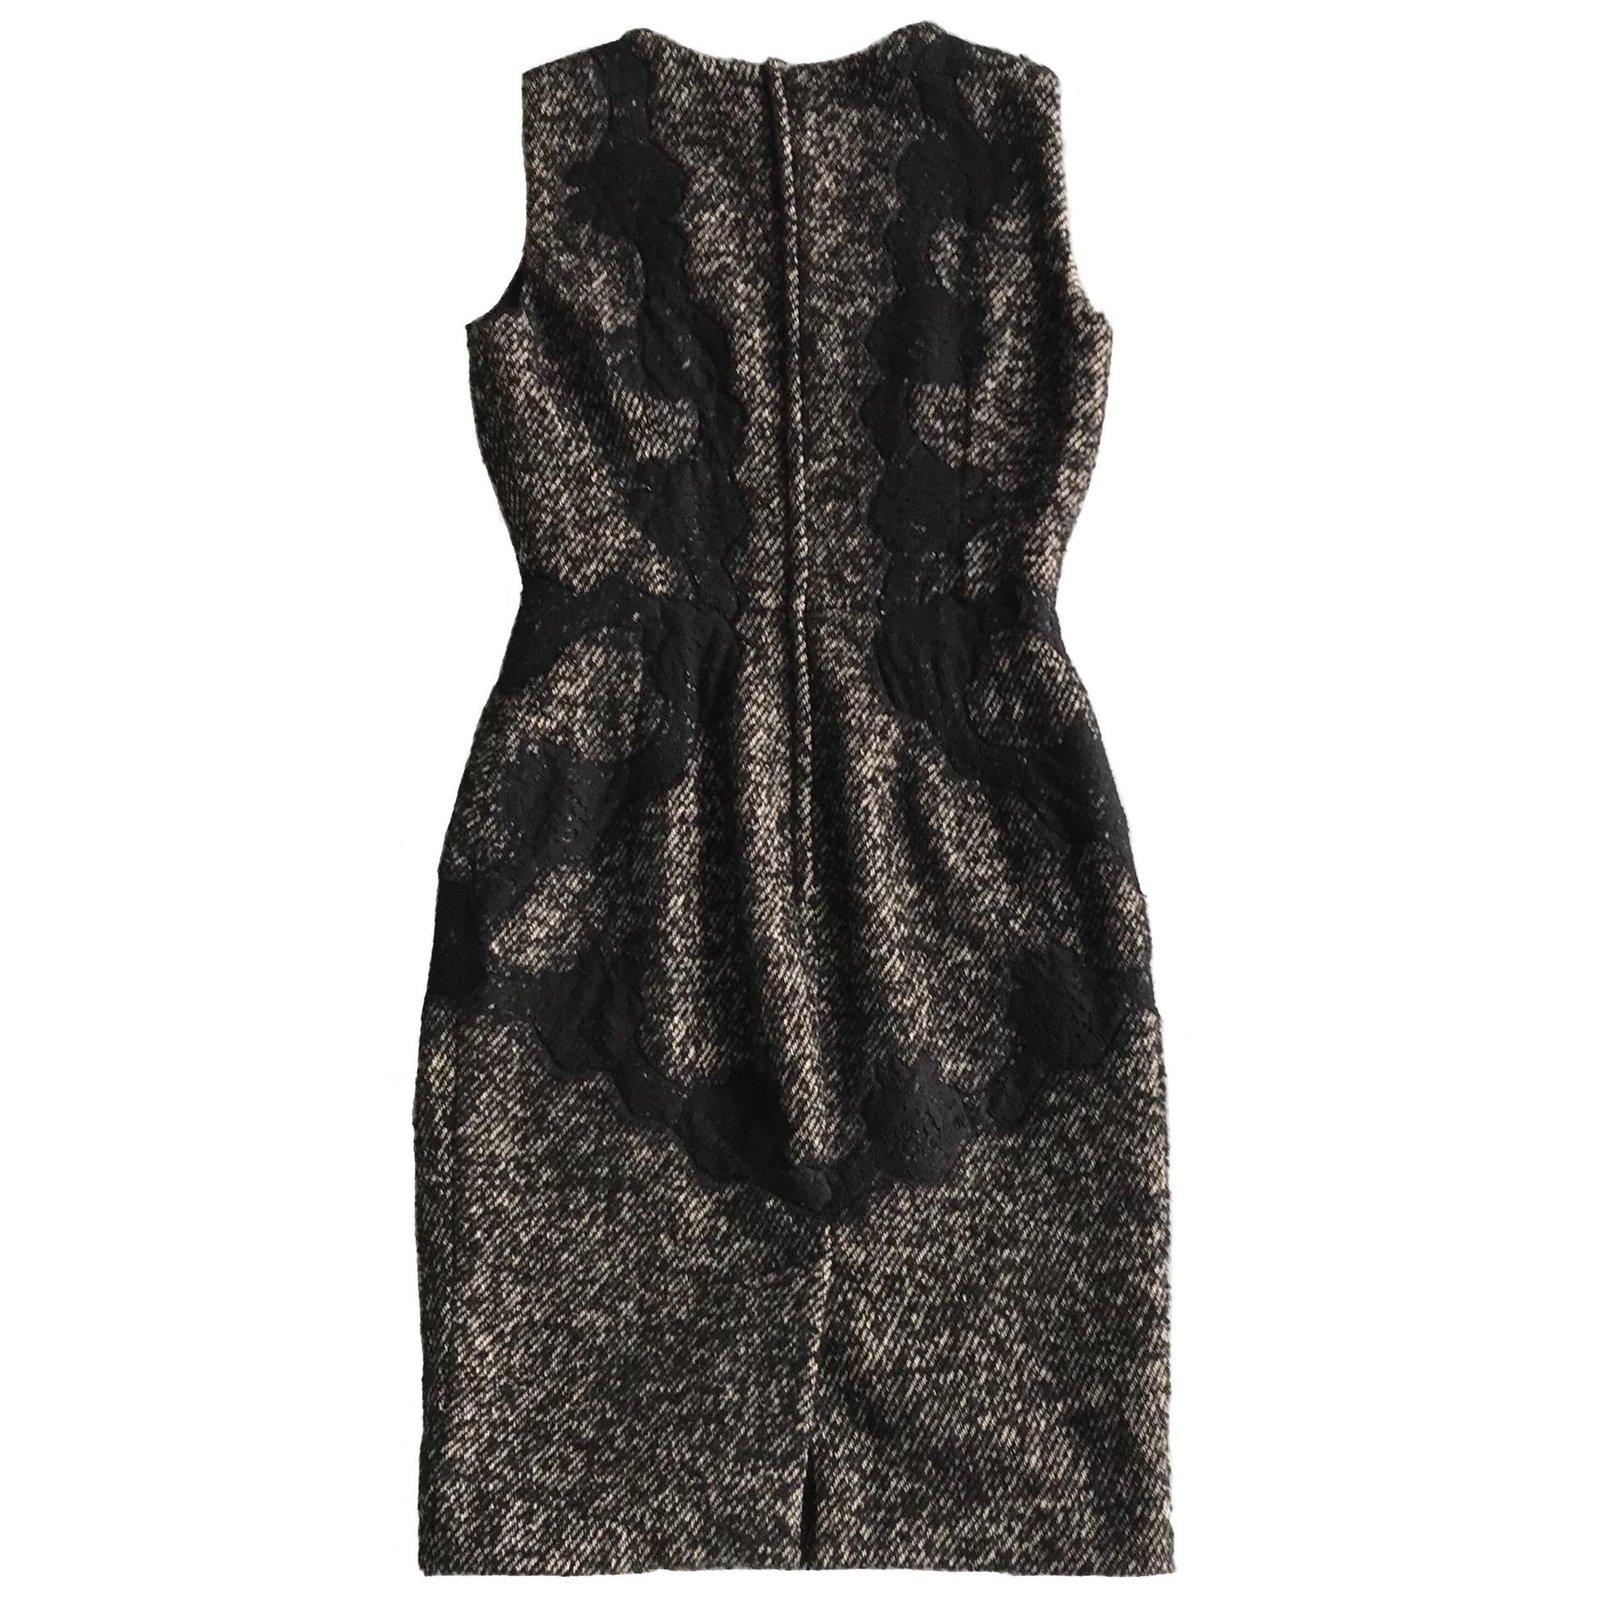 d2d48ffdde2 Dolce   Gabbana Knitwear Knitwear Wool Black ref.85582 - Joli Closet